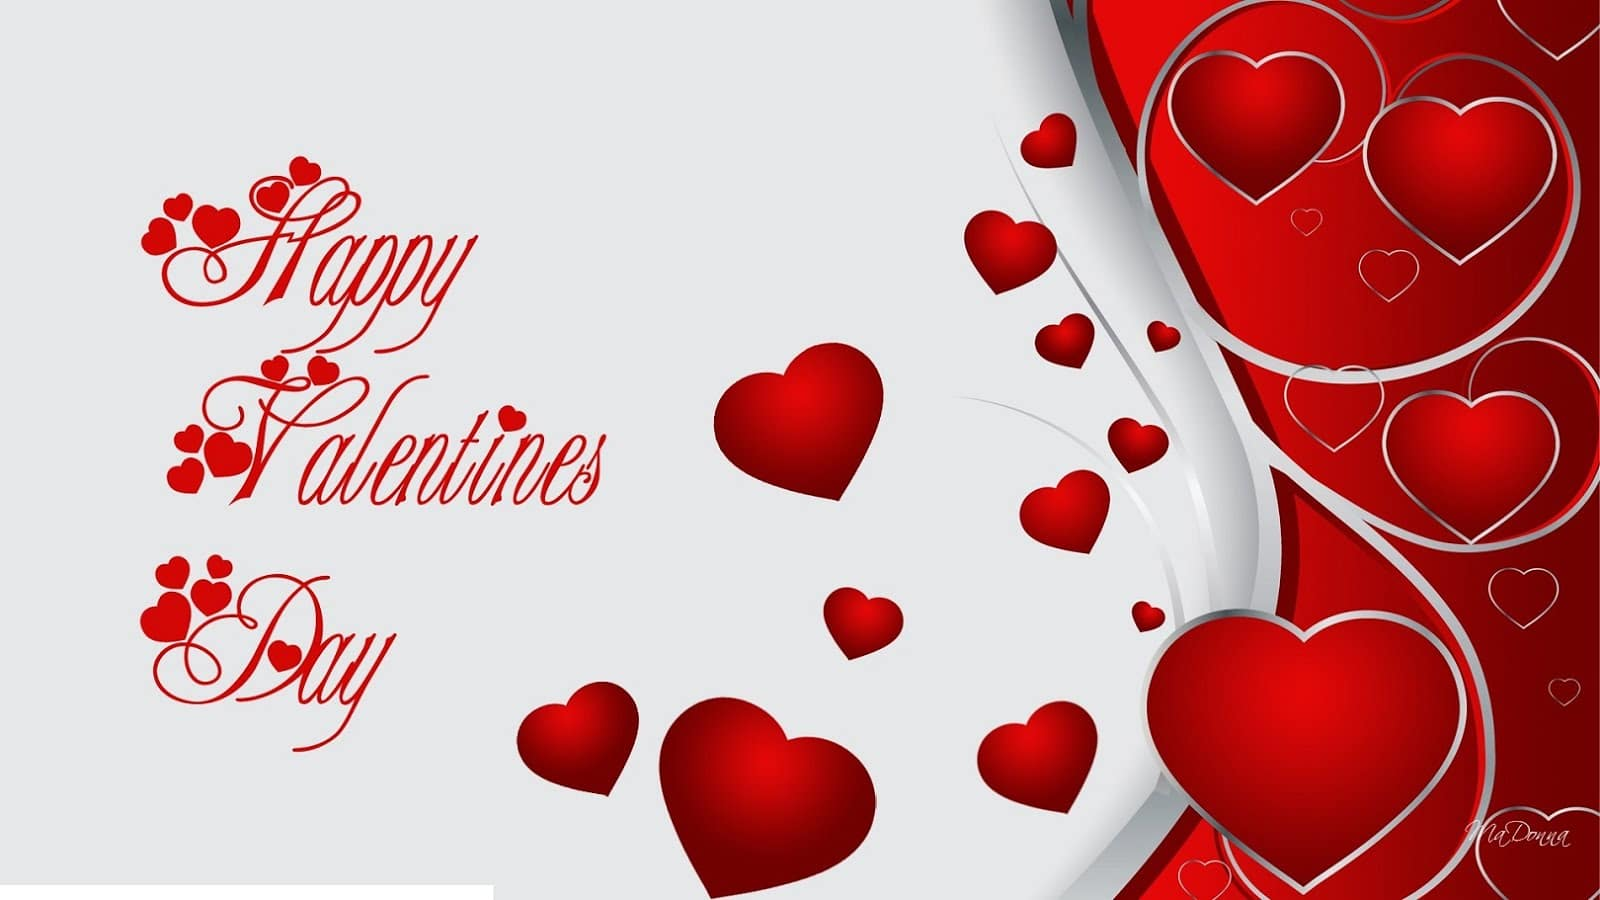 Happy Valentine's Day SayingsHappy Valentine's Day Sayings